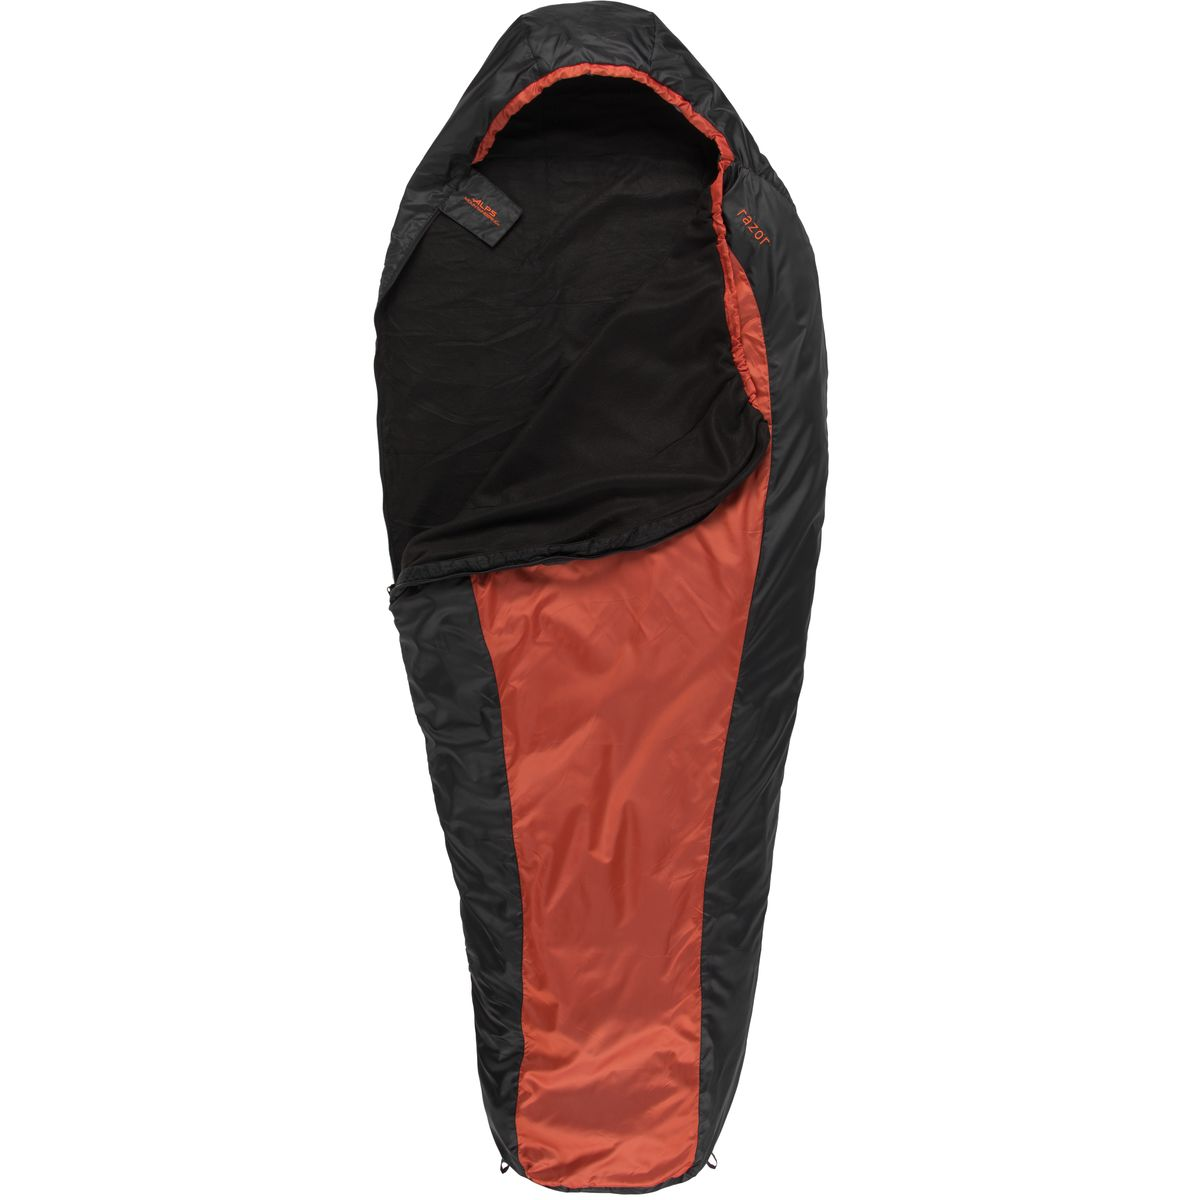 ALPS Mountaineering Razor Fleece Sleeping Bag/Liner